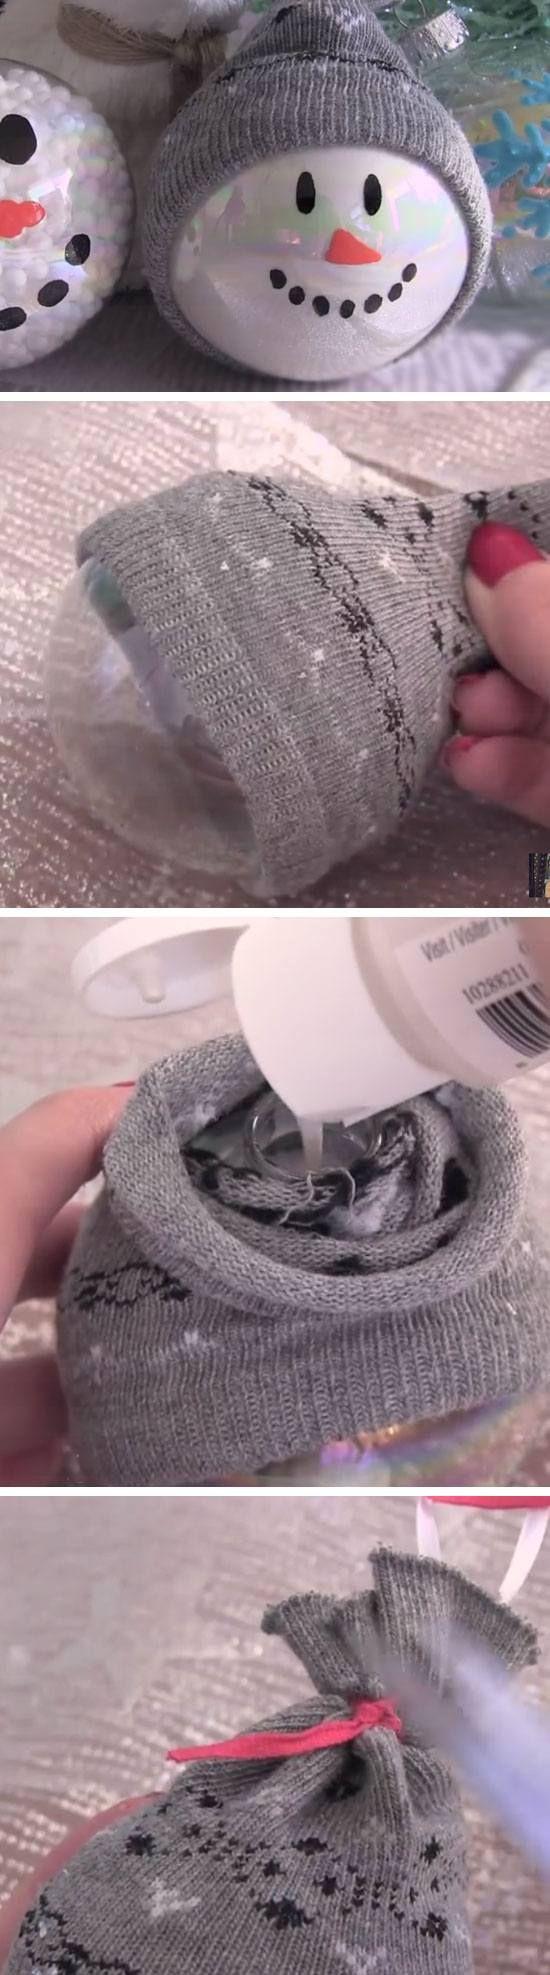 DIY Sock Snowman Ornament   Dollar Store DIY Christmas Decor Ideas on a Budget